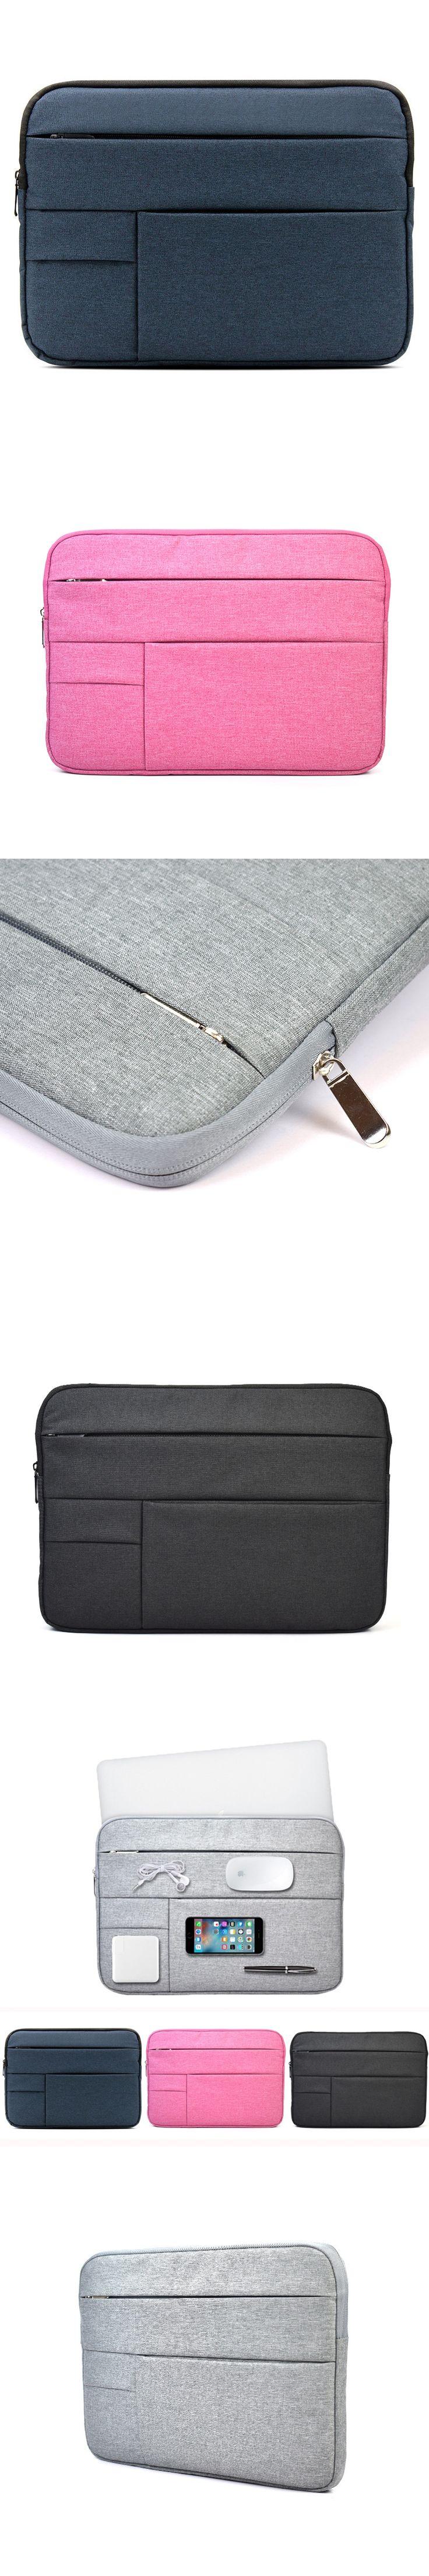 Woolen Felt Wear Resistant Laptop Sleeve Bag Ultrabook Pouch 11 12 13 14 15 Inch Case For Apple Macbook Air 11 Pro13 Reitina 15